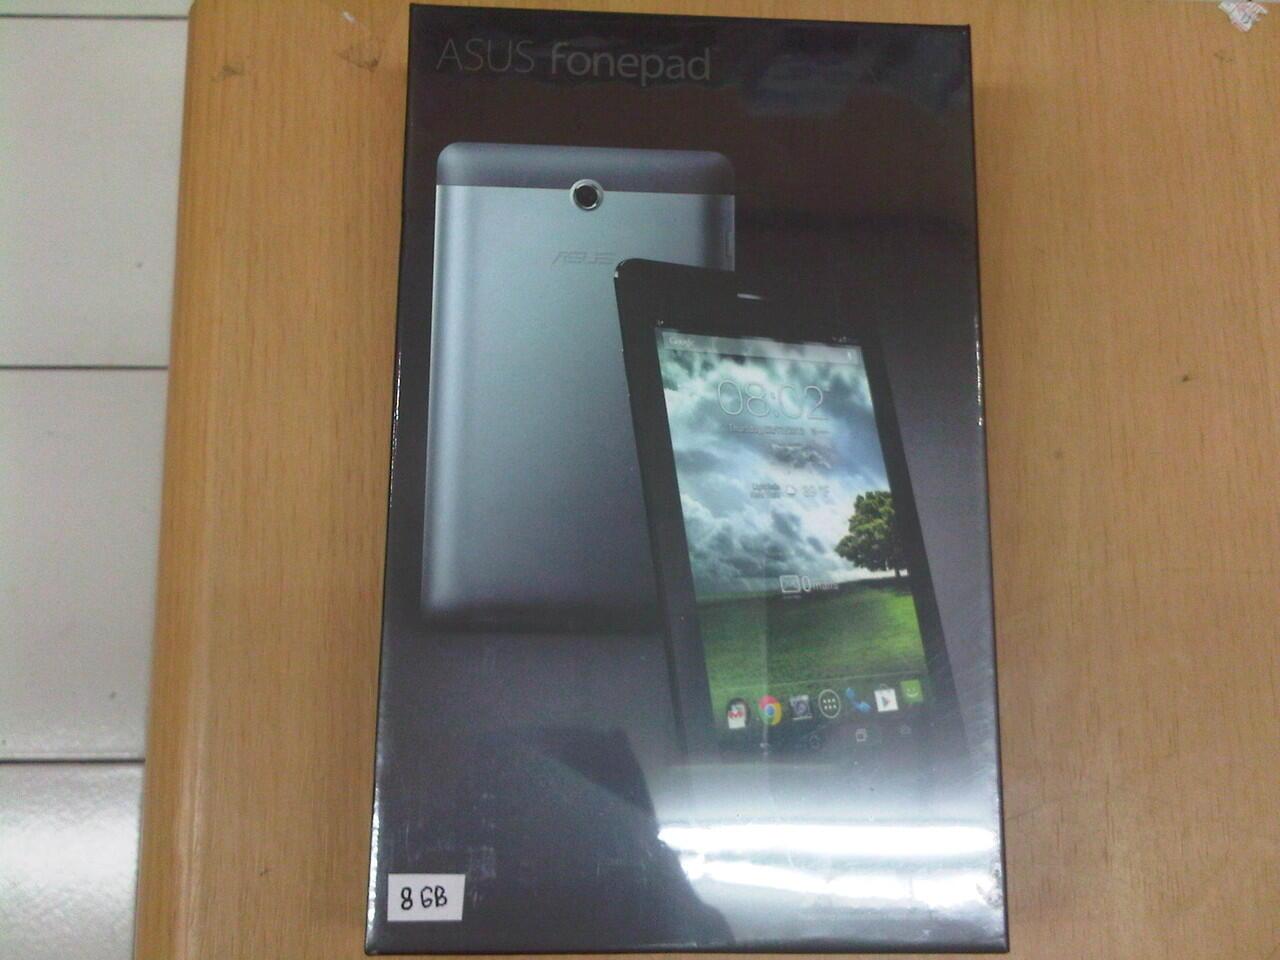 jual tablet Asus FonePad ME371MG (1GB/8GB/3G) harga kaskus @kliknklik